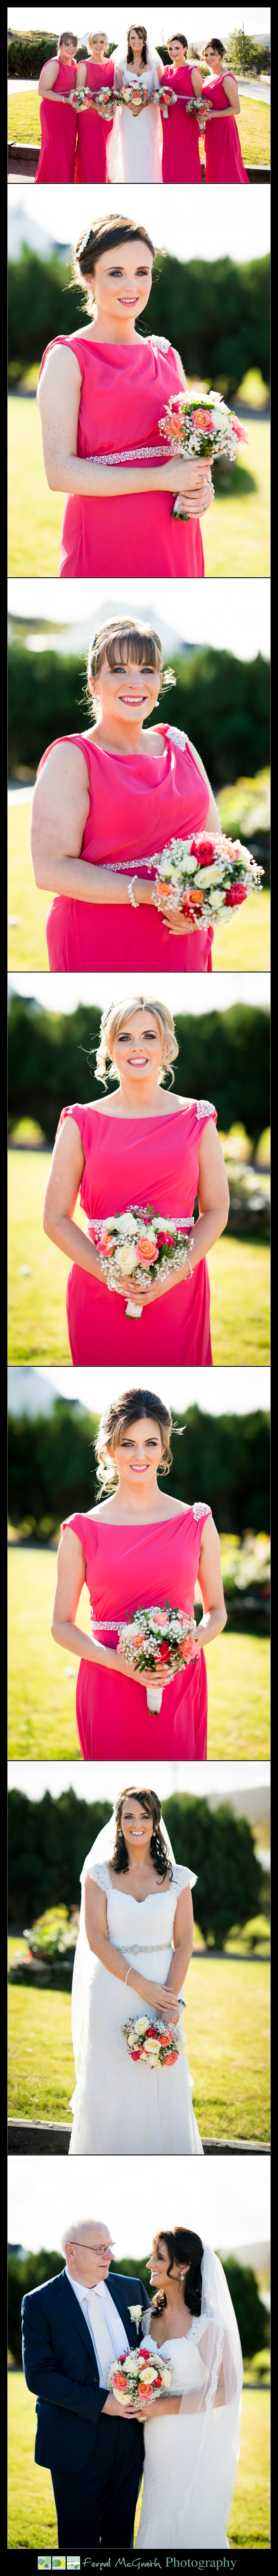 Mill Park Hotel Wedding Laura + John bridesmaids portraits